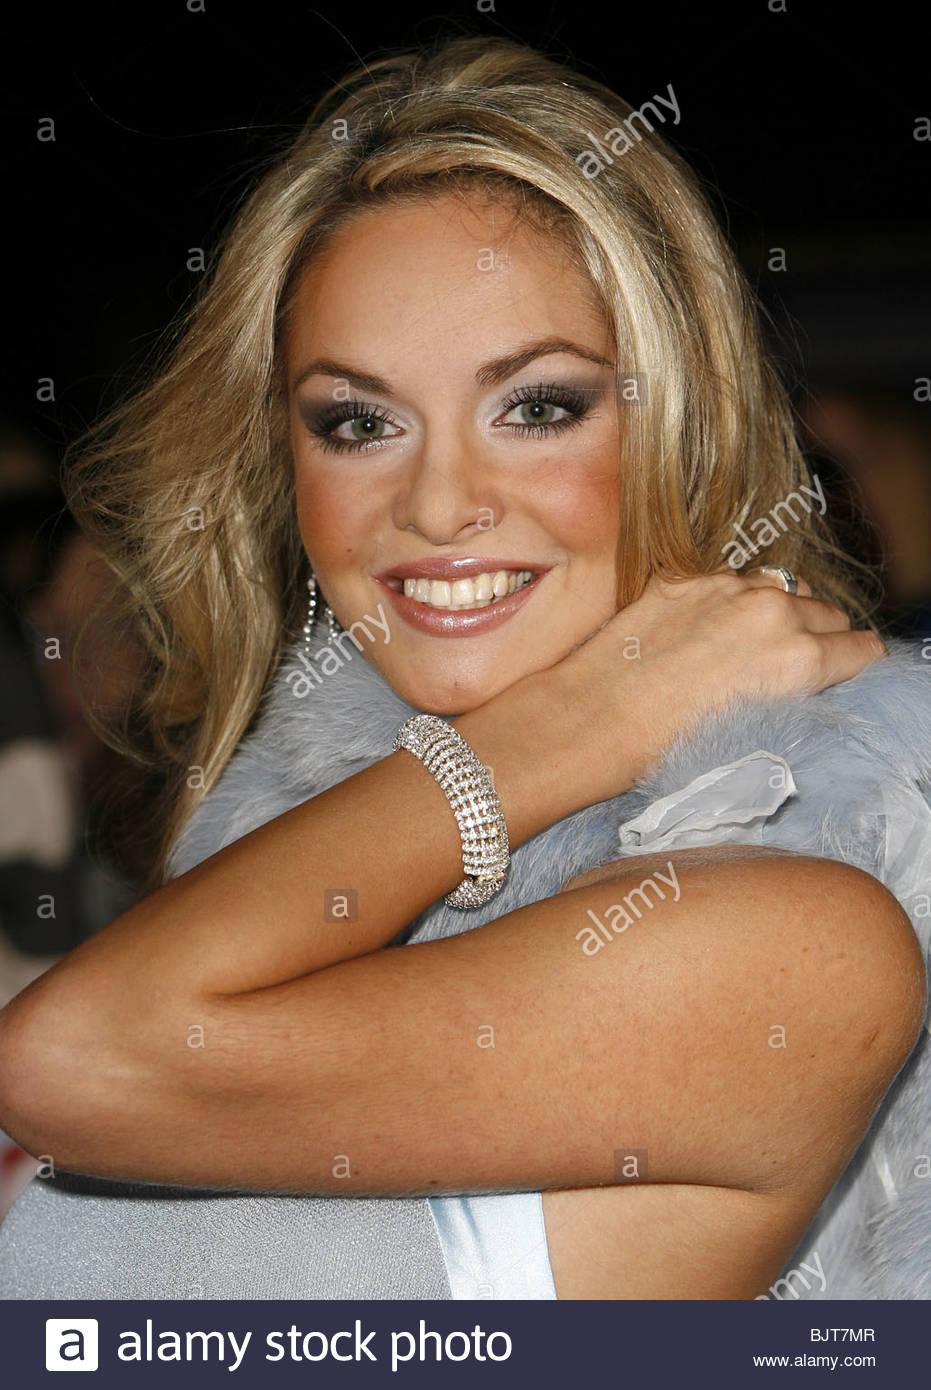 tatana kucharova, miss world 2006. - Página 3 Tatana10